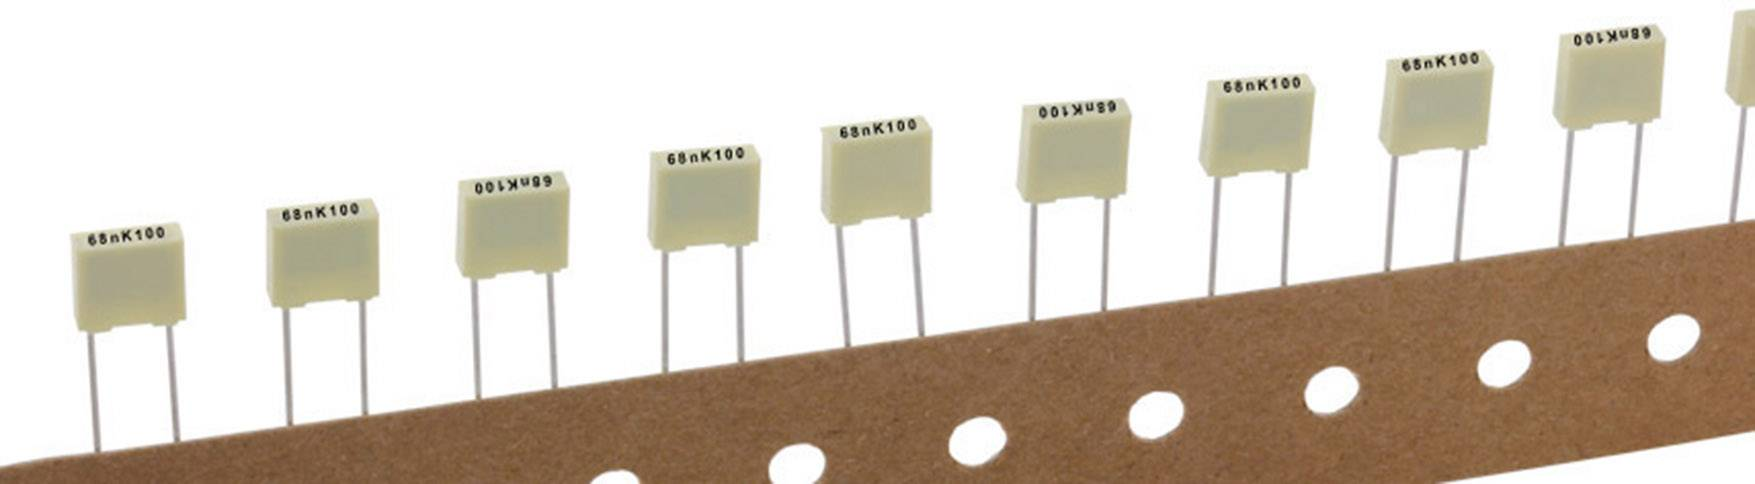 Polyesterový kondenzátor Kemet R82DC3330DQ60K+ radiálne vývody, 330 nF, 63 V,10 %, 5 mm, (d x š x v) 7.2 x 3.5 mm x 7.5 mm, 1 ks